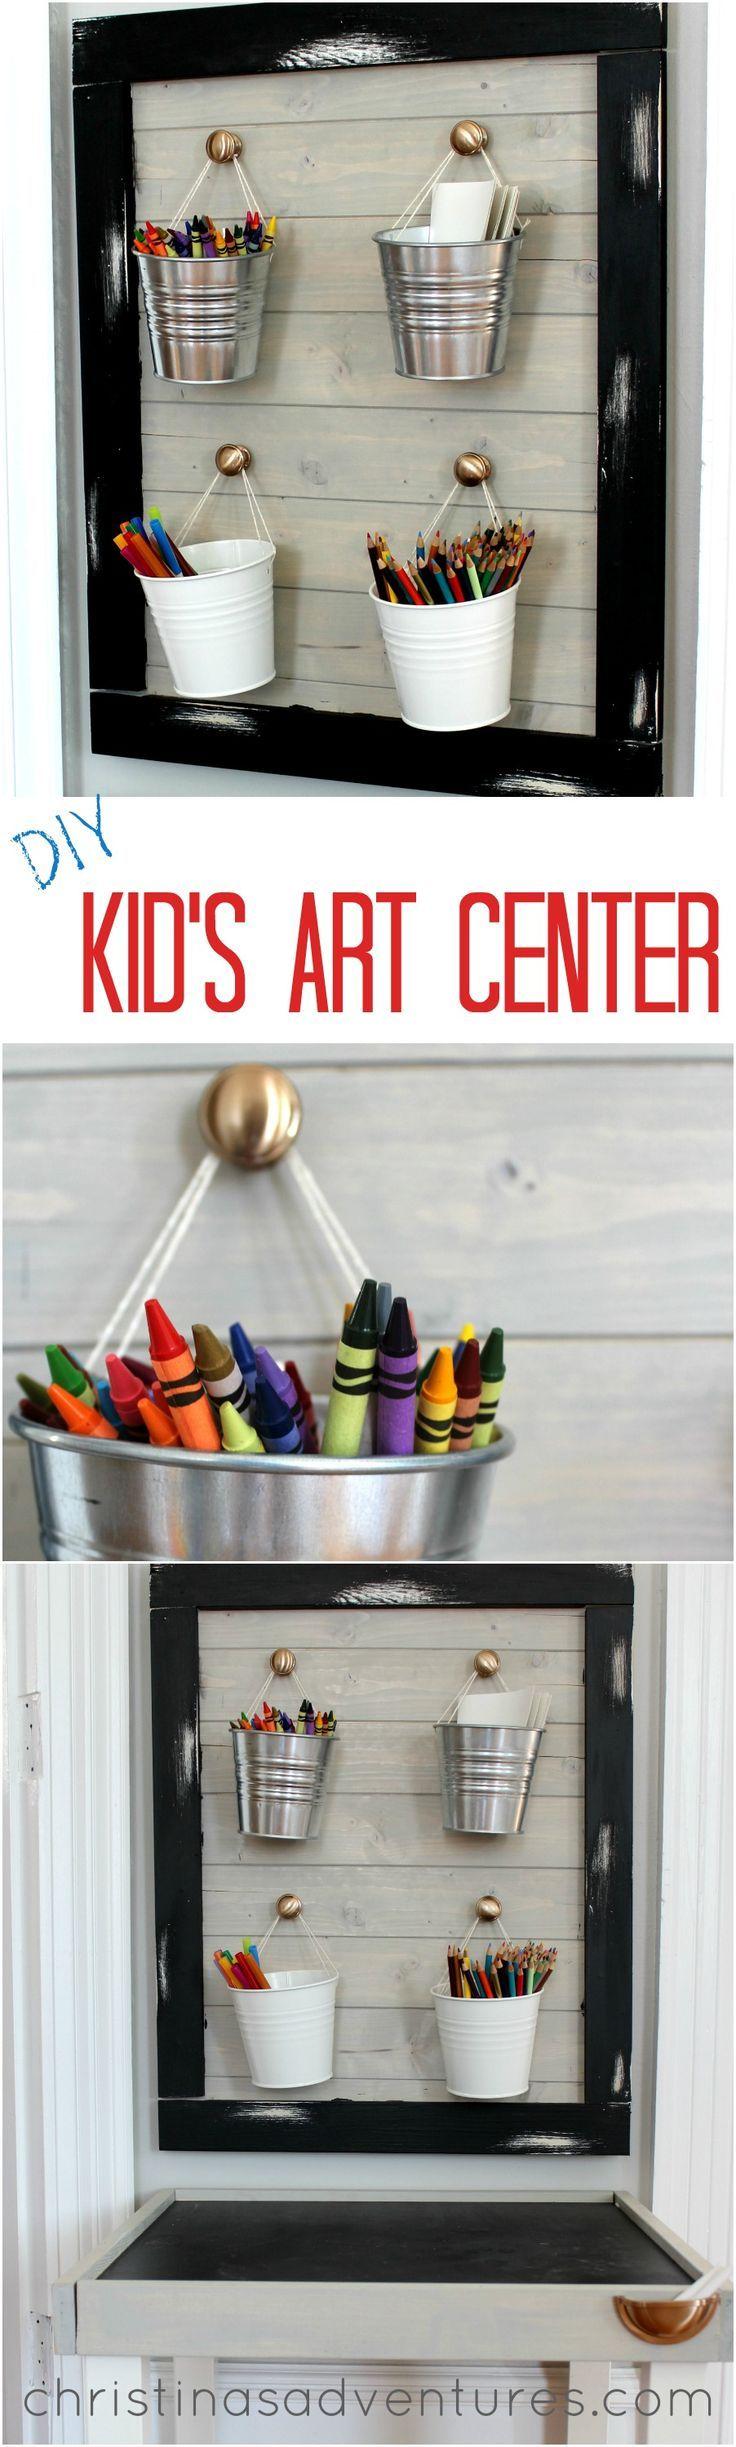 Adorable & affordable DIY kid's art center